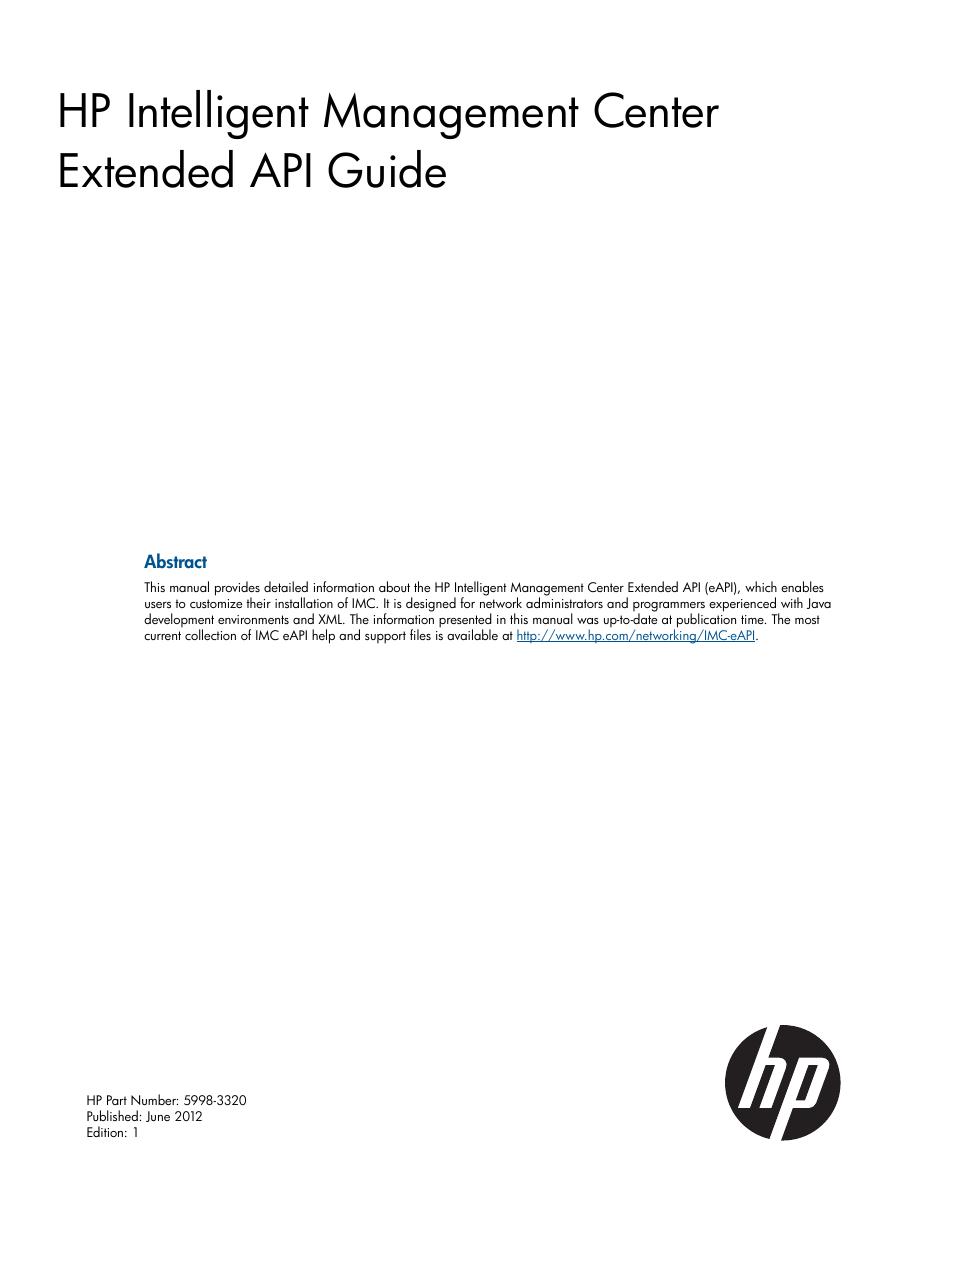 HP Intelligent Management Center Licenses User Manual | 438